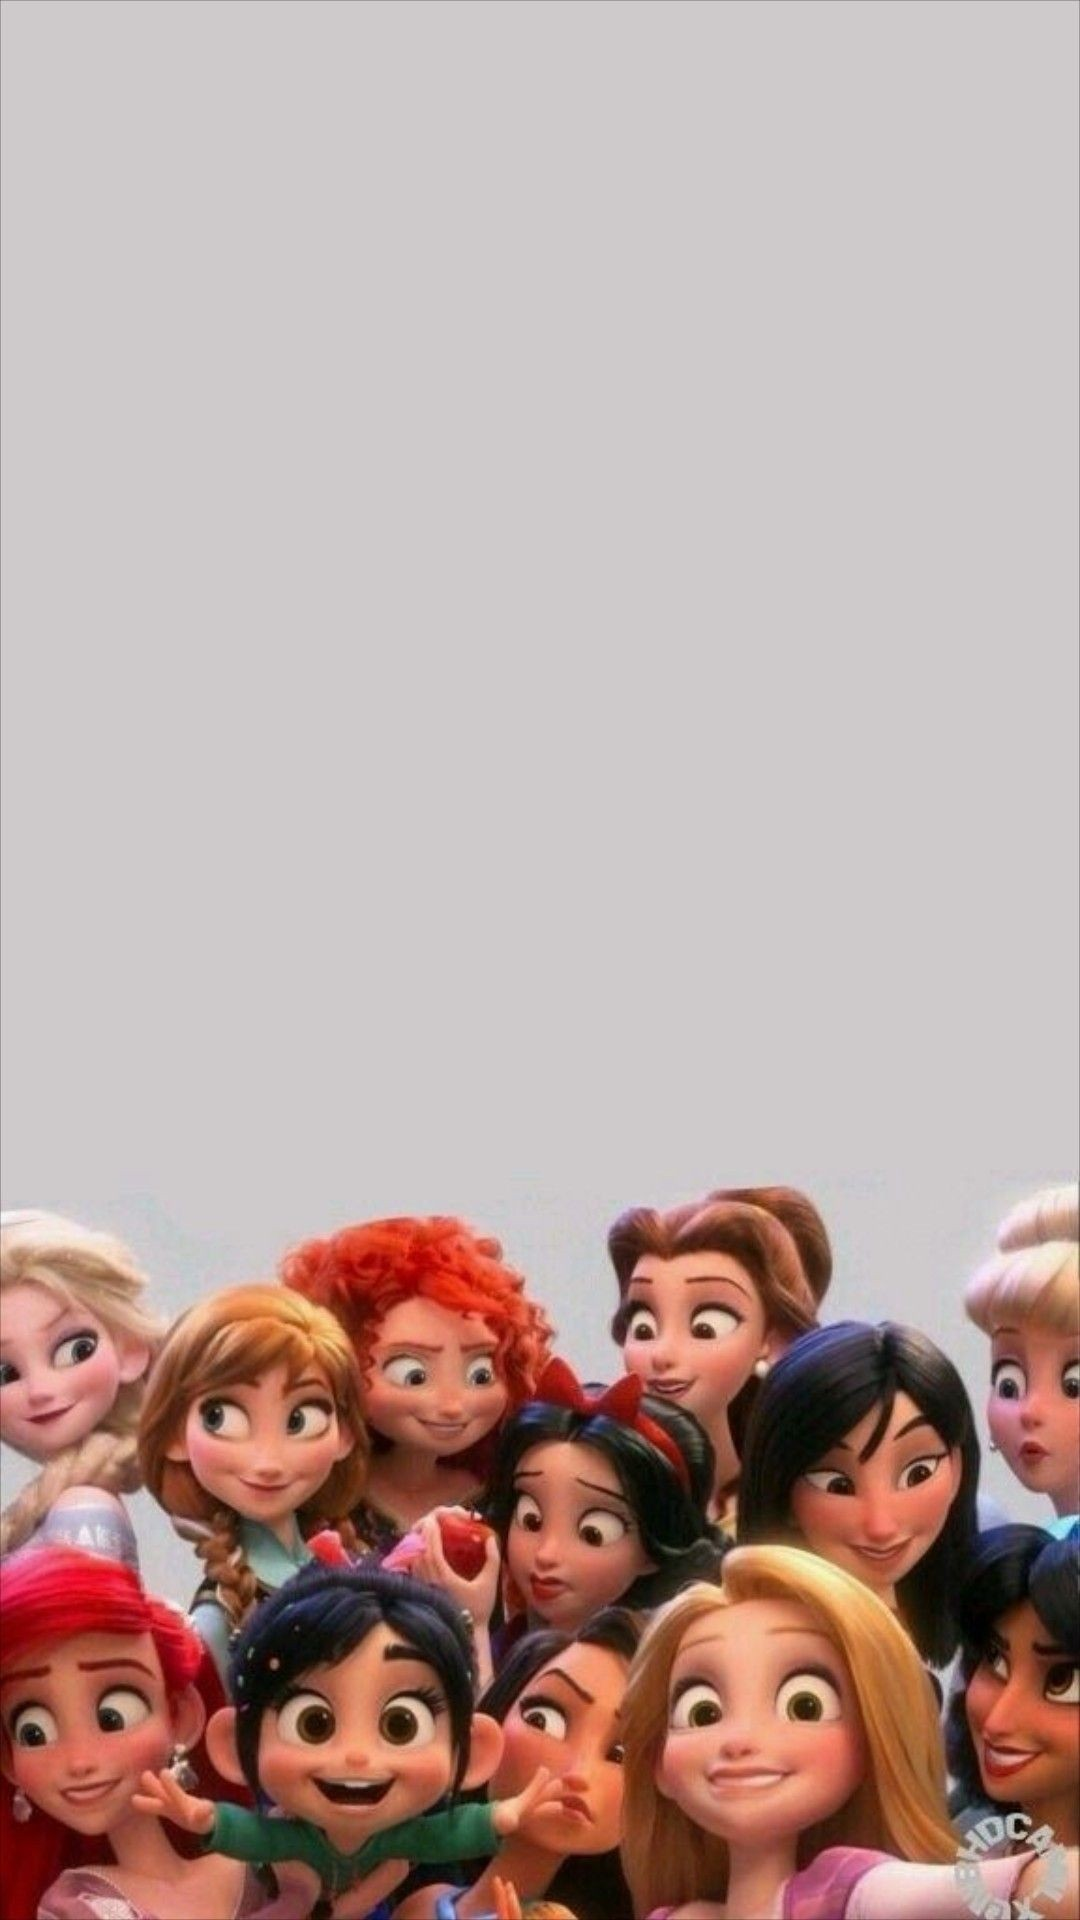 Disney iPhone 7 wallpaper